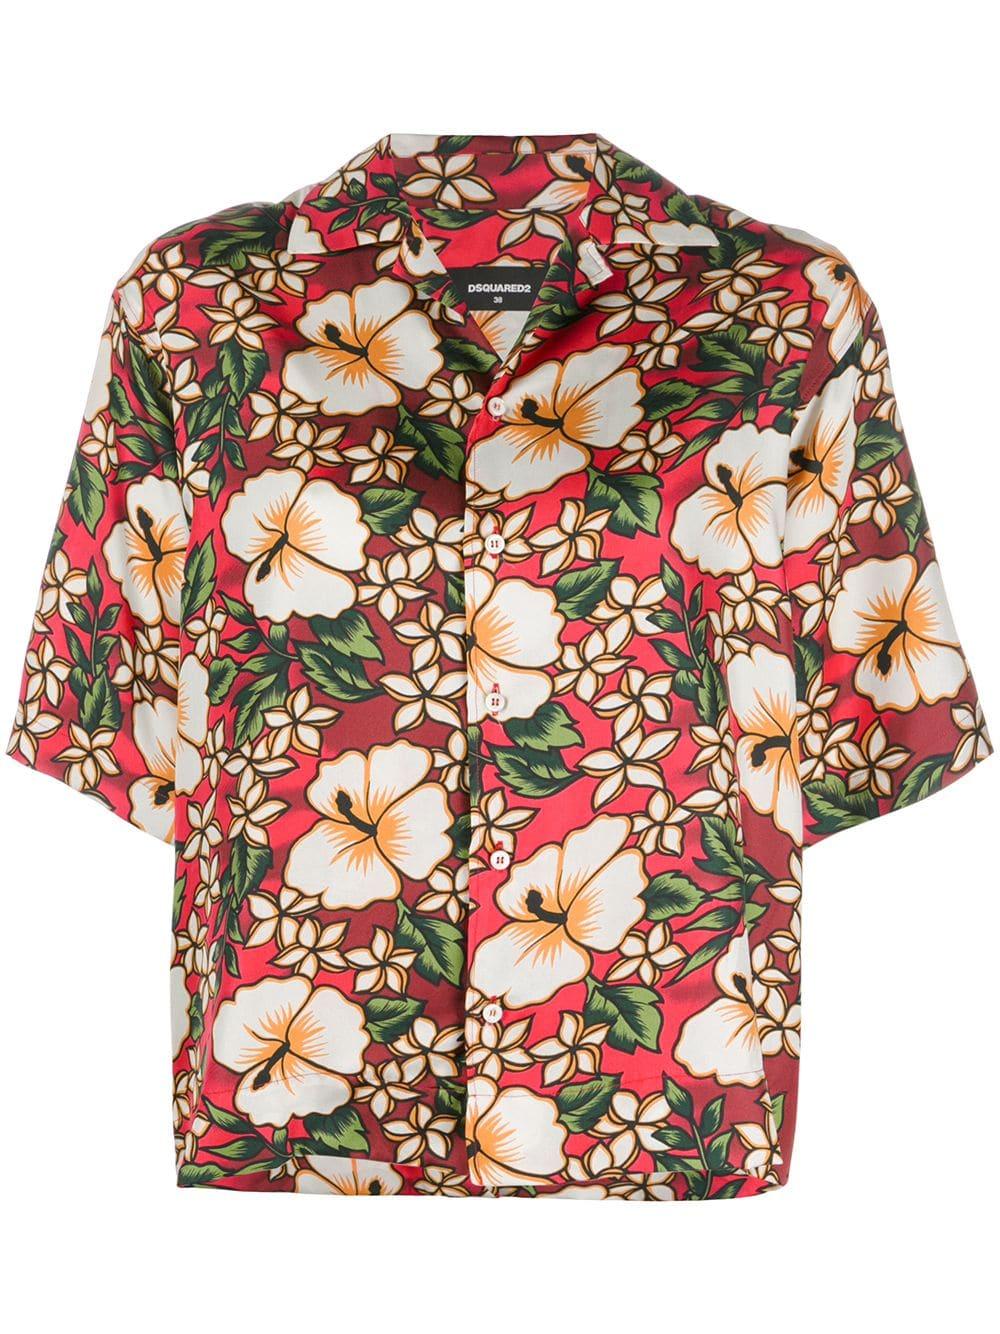 Dsquared2 Hawaiian Floral Print Shirt Multicolour Floral Print